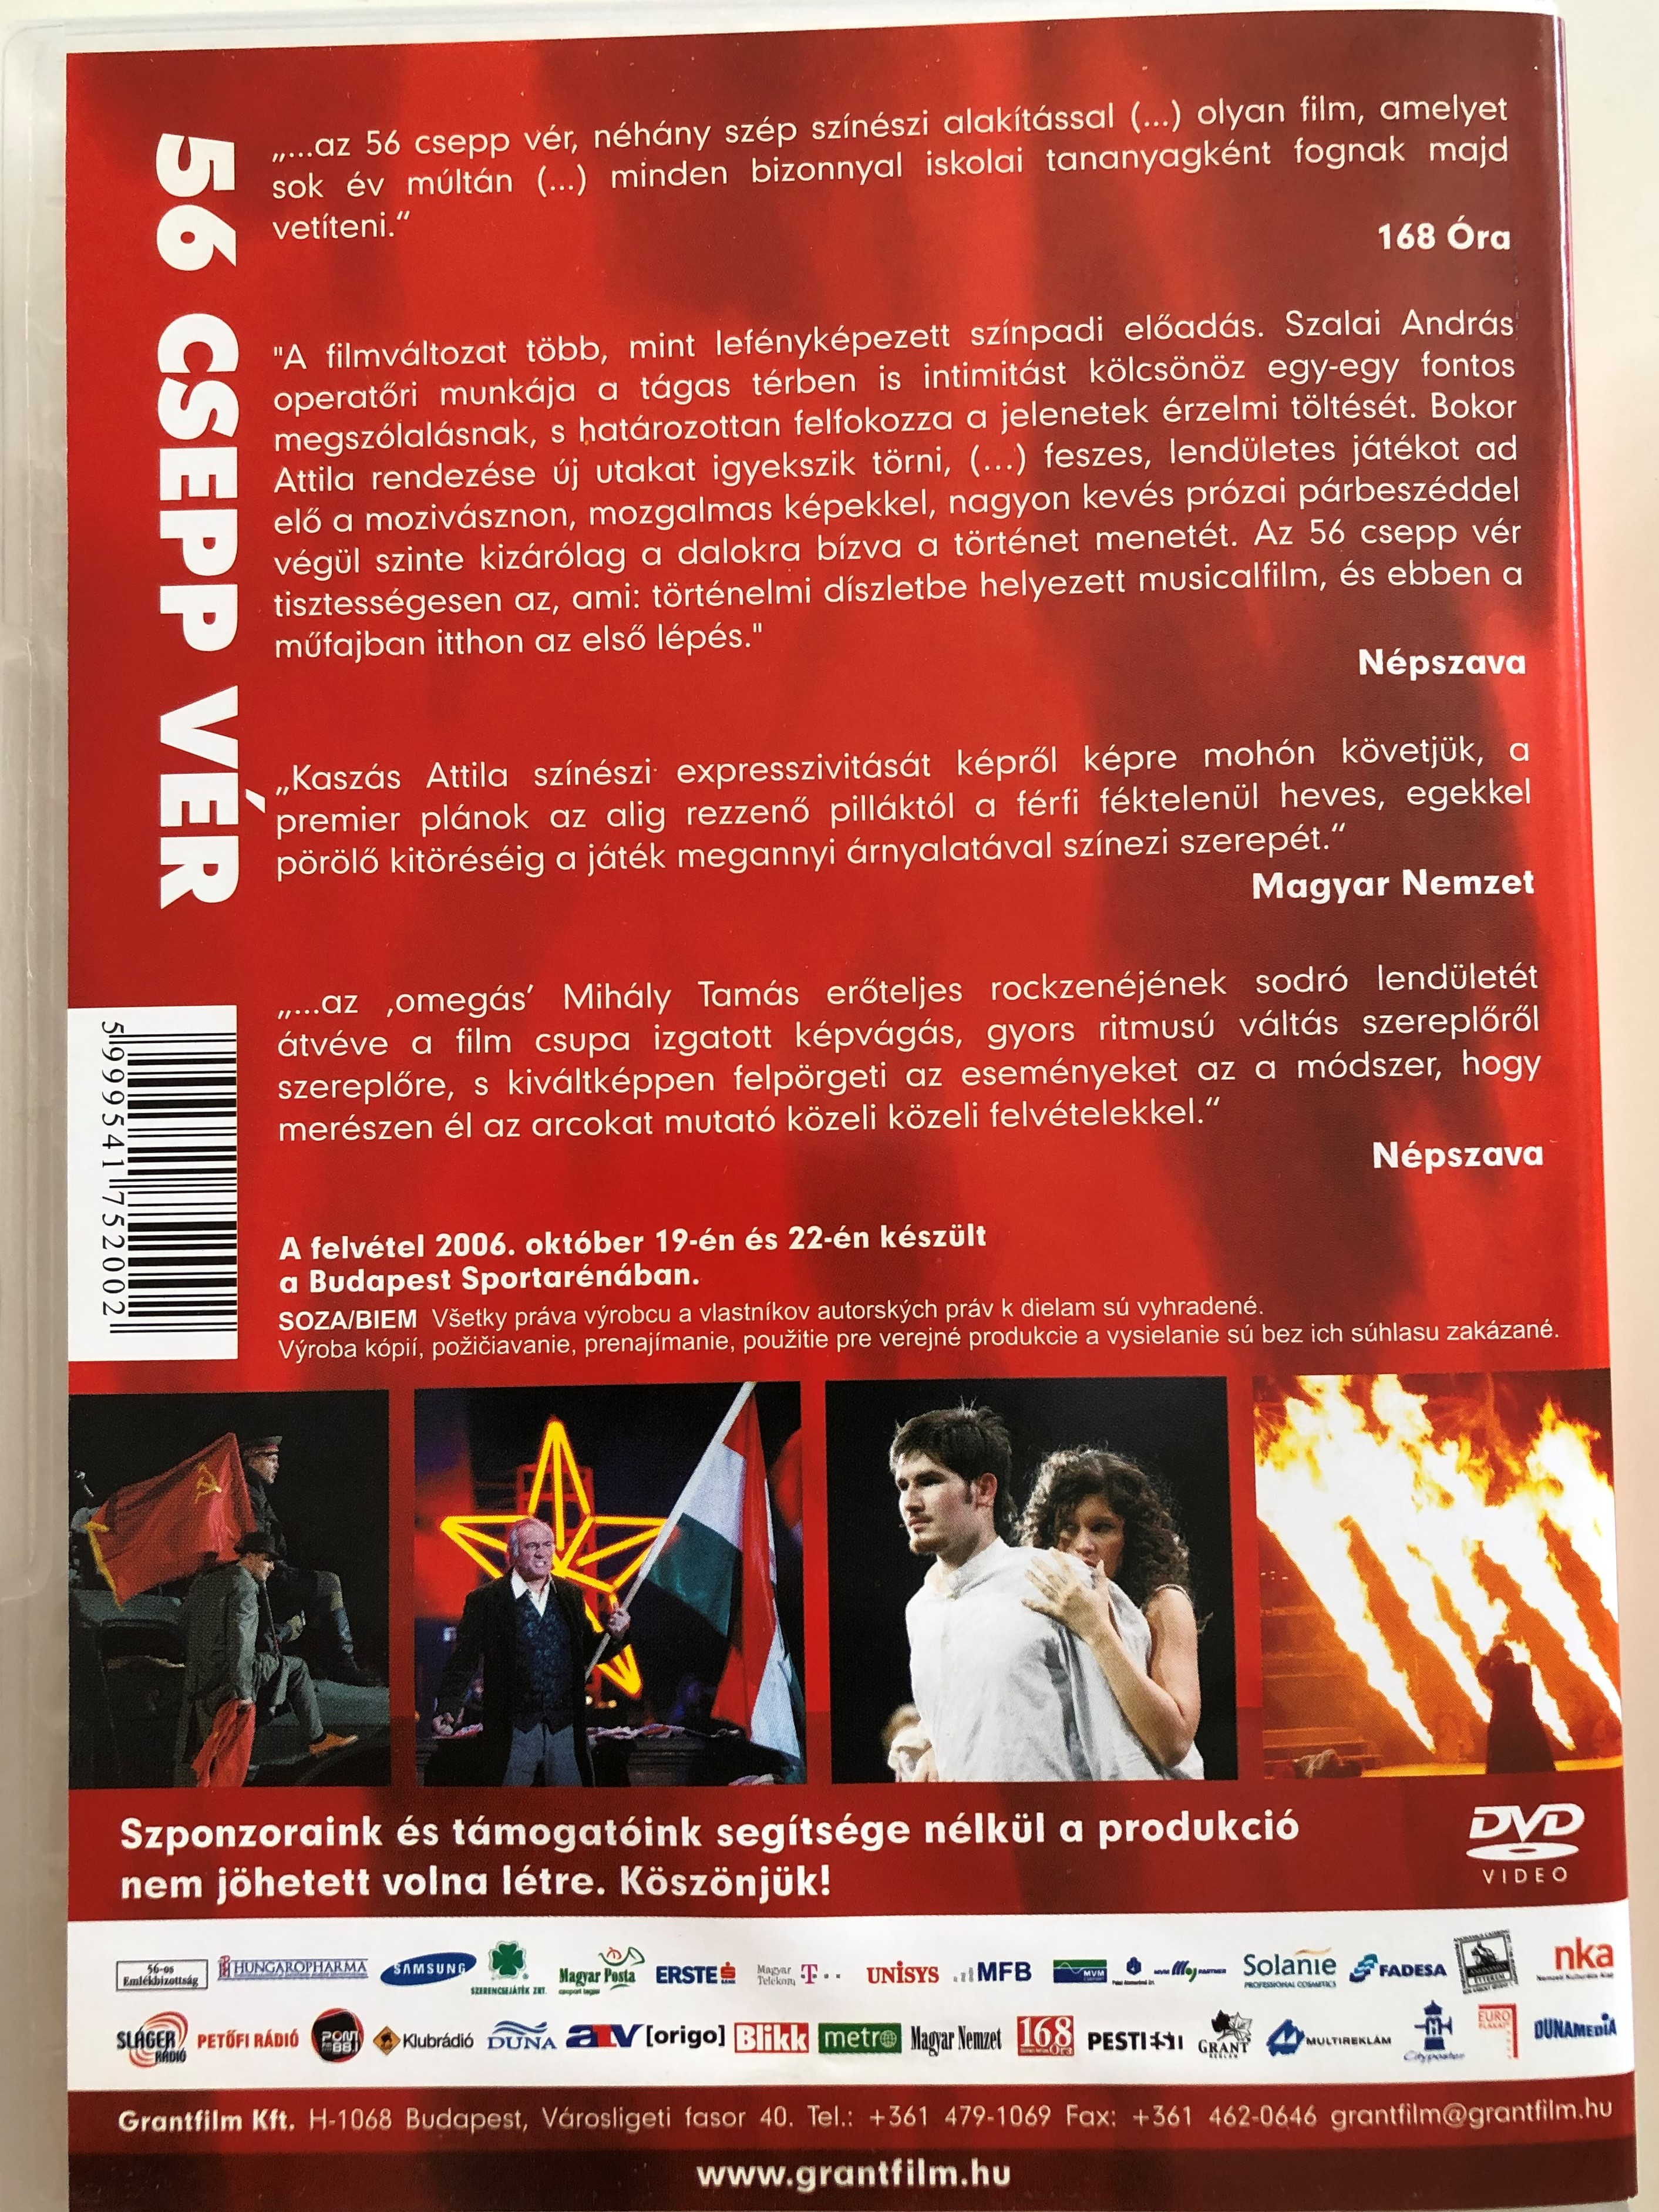 56-csepp-v-r-dvd-2006-56-drops-of-blood-directed-by-bokor-attila-starring-kasz-s-attila-palcs-tam-s-veres-m-nika-miller-zolt-n-keresztes-ildik-hoffmann-m-nika-forg-cs-p-ter-kiss-zolt-n-rock-musical-commemorating-.jpg